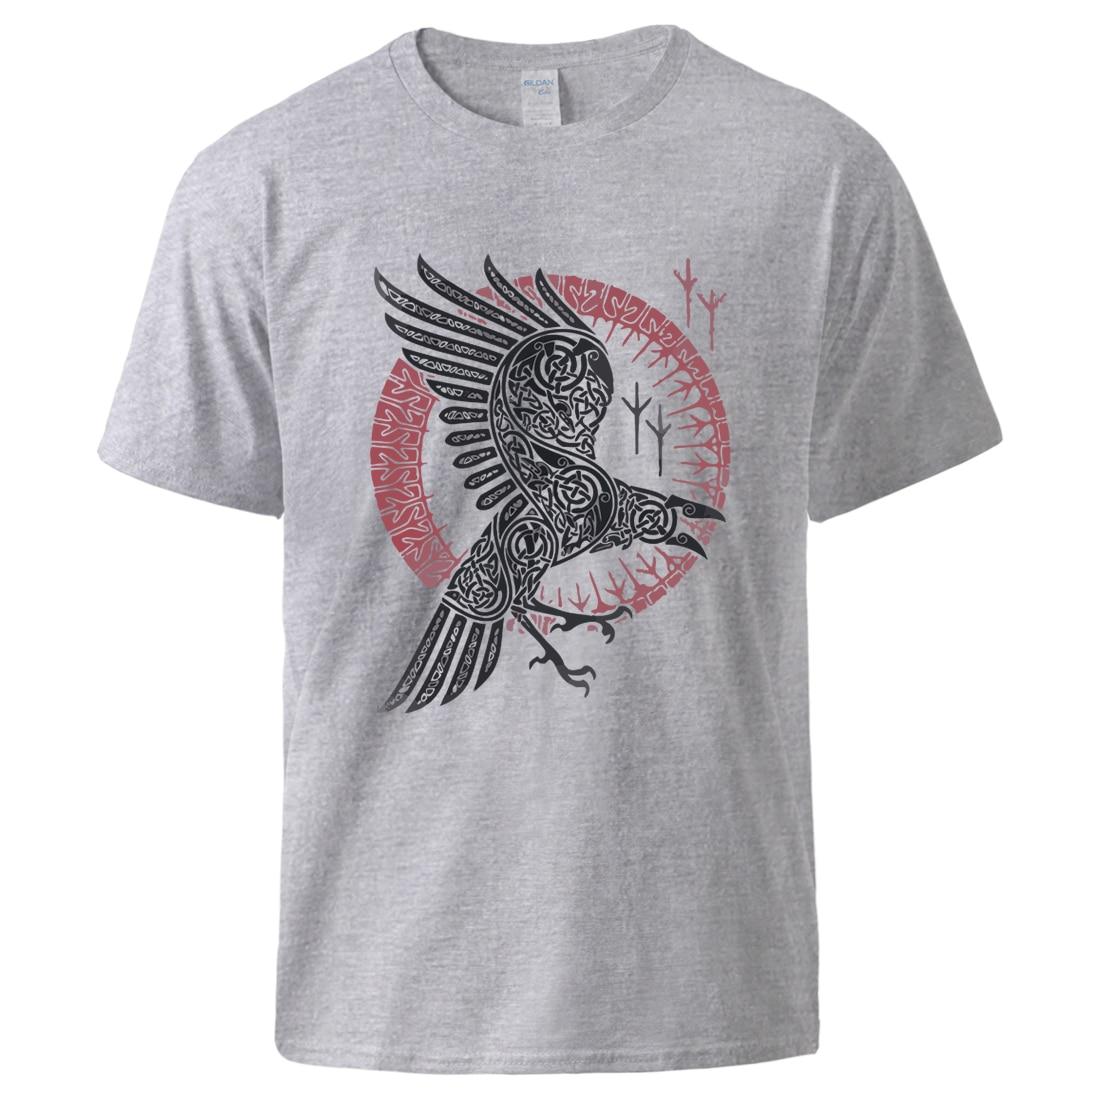 Viking legend Ragnar's Raven Tshirt Man Casual Sportswear Cool Short Sleeve Top 2020 Man High Quality 100% Cotton Loose Tshirts